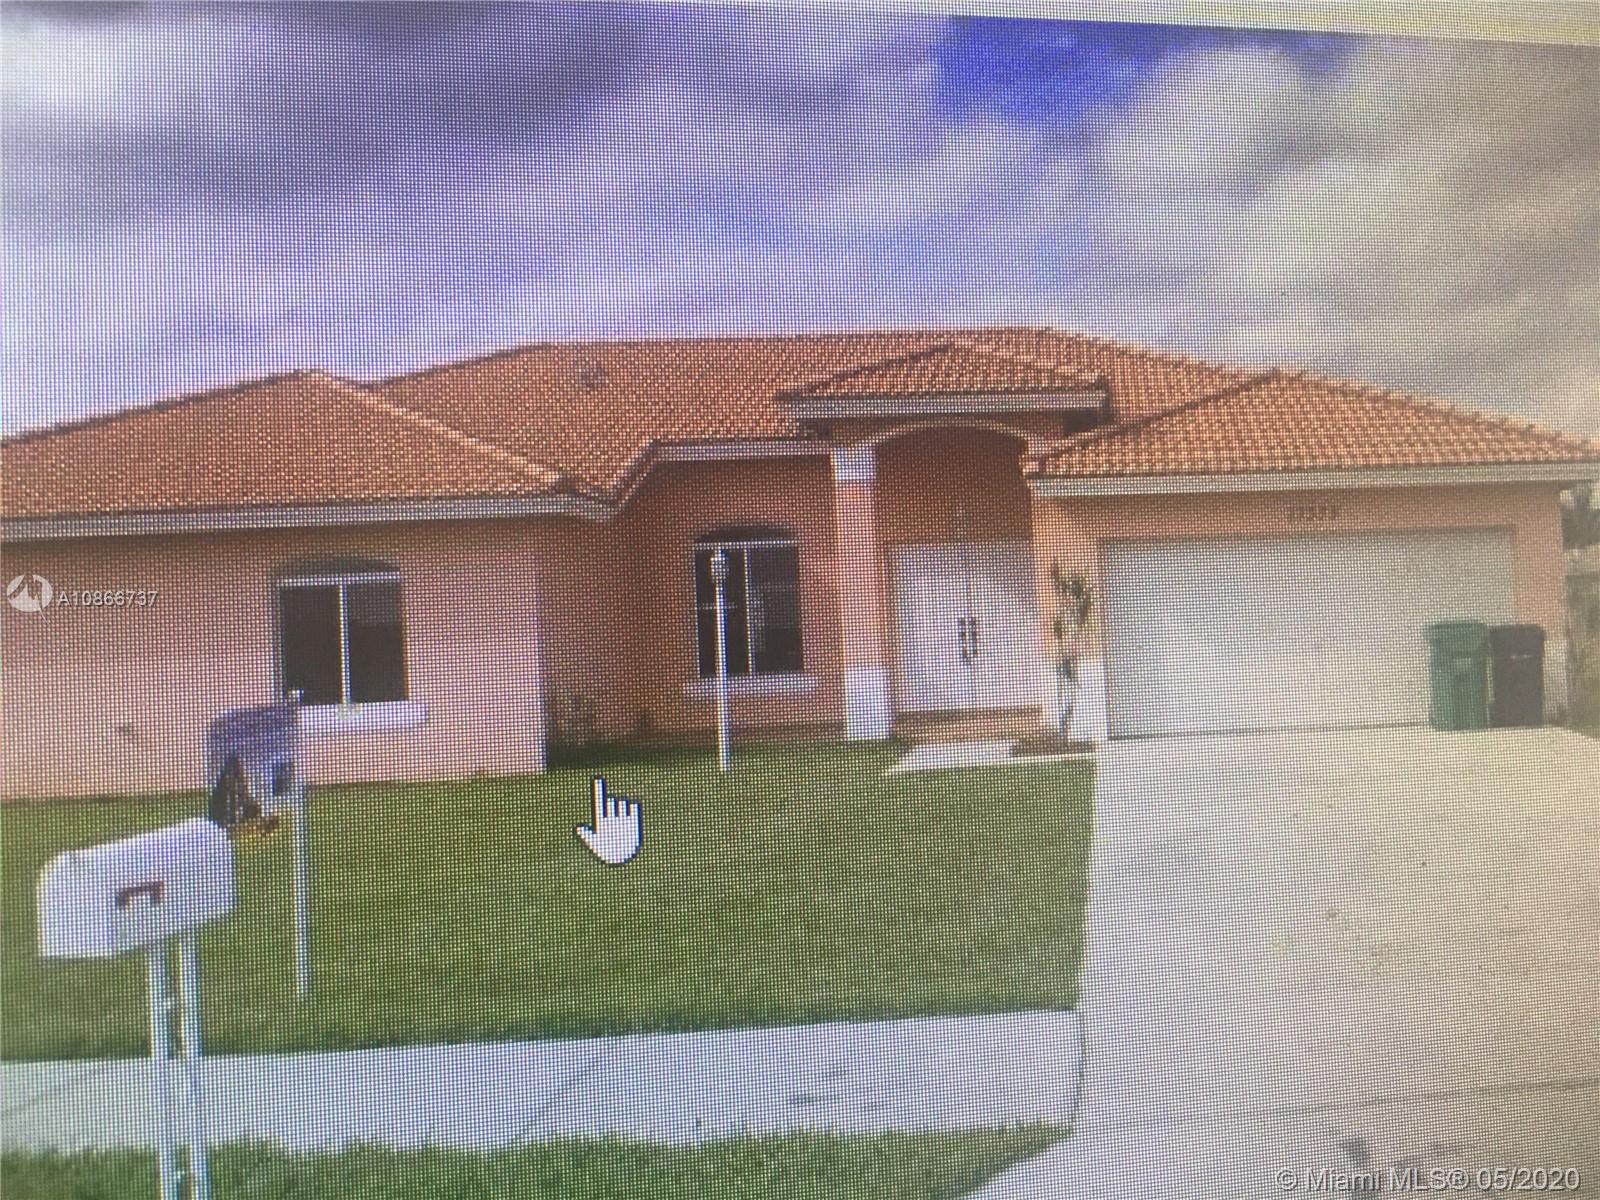 17373 SW 284th St #0 Property Photo